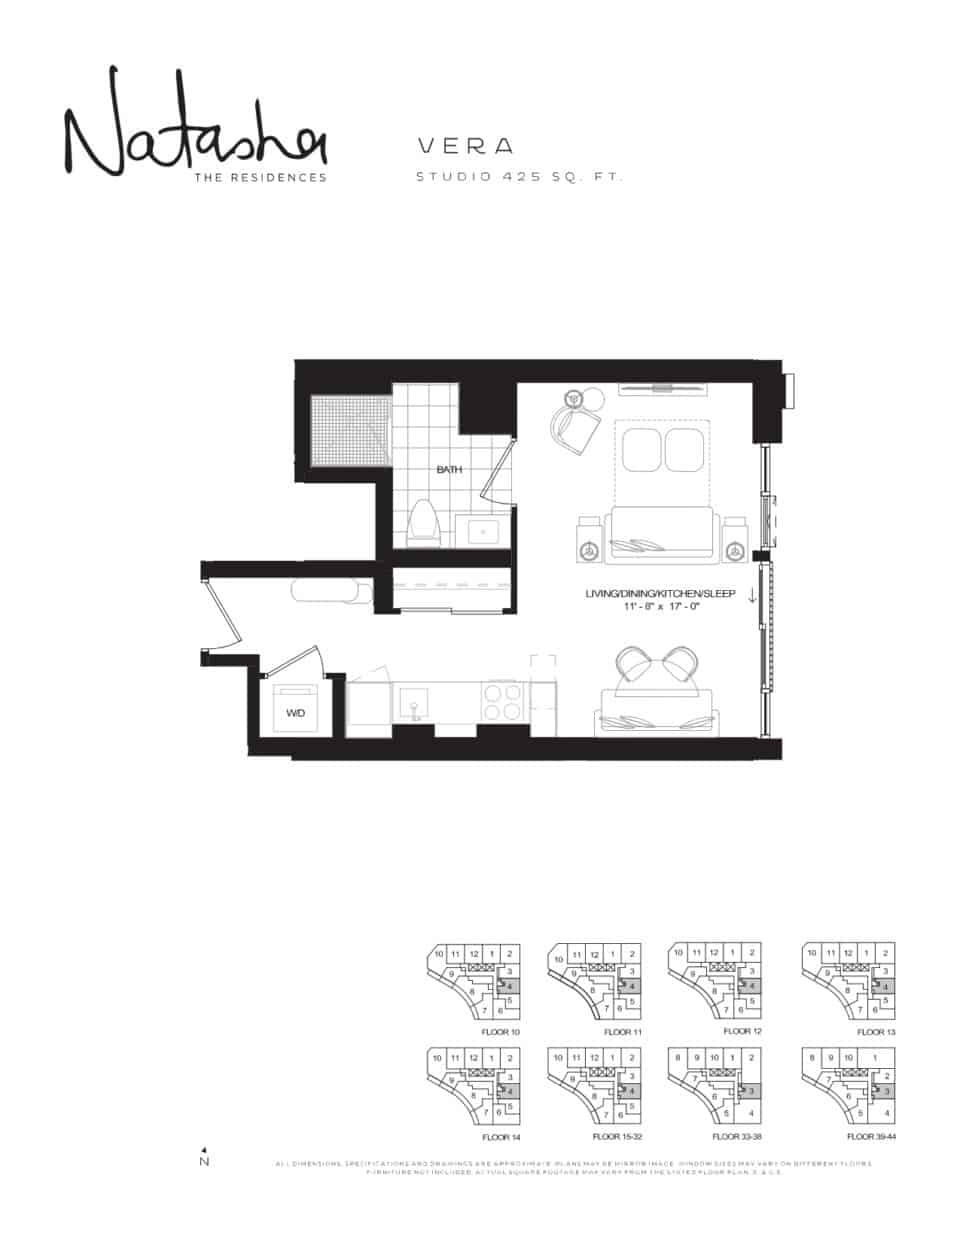 2021 09 02 11 03 29 natashatheresidences lanterradevelopments floorplans vera